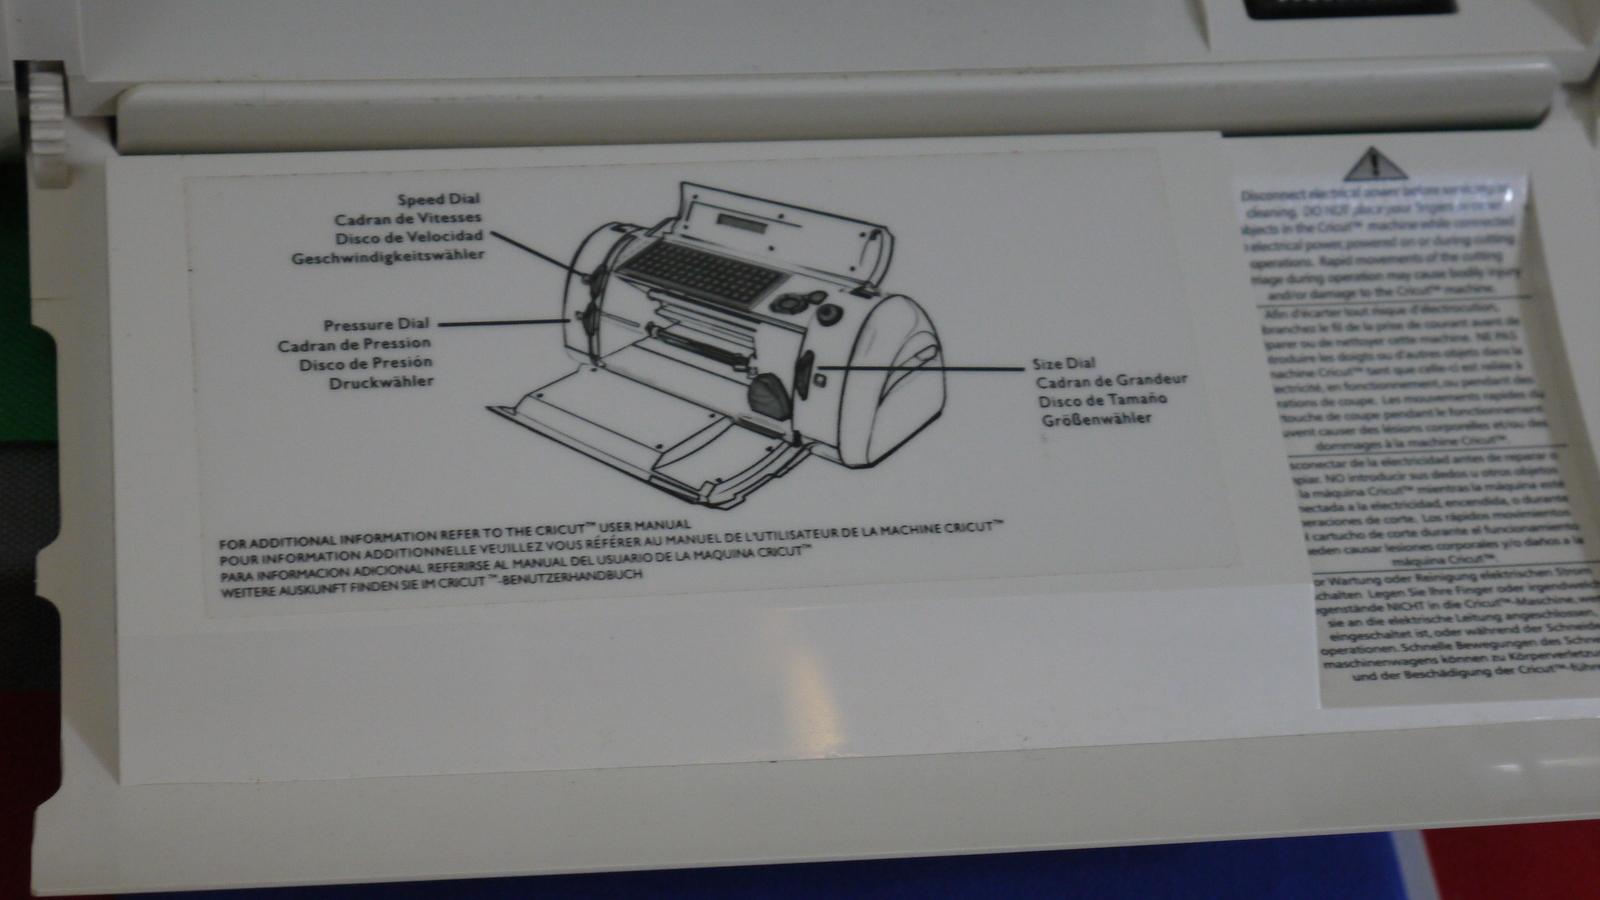 Item image 6